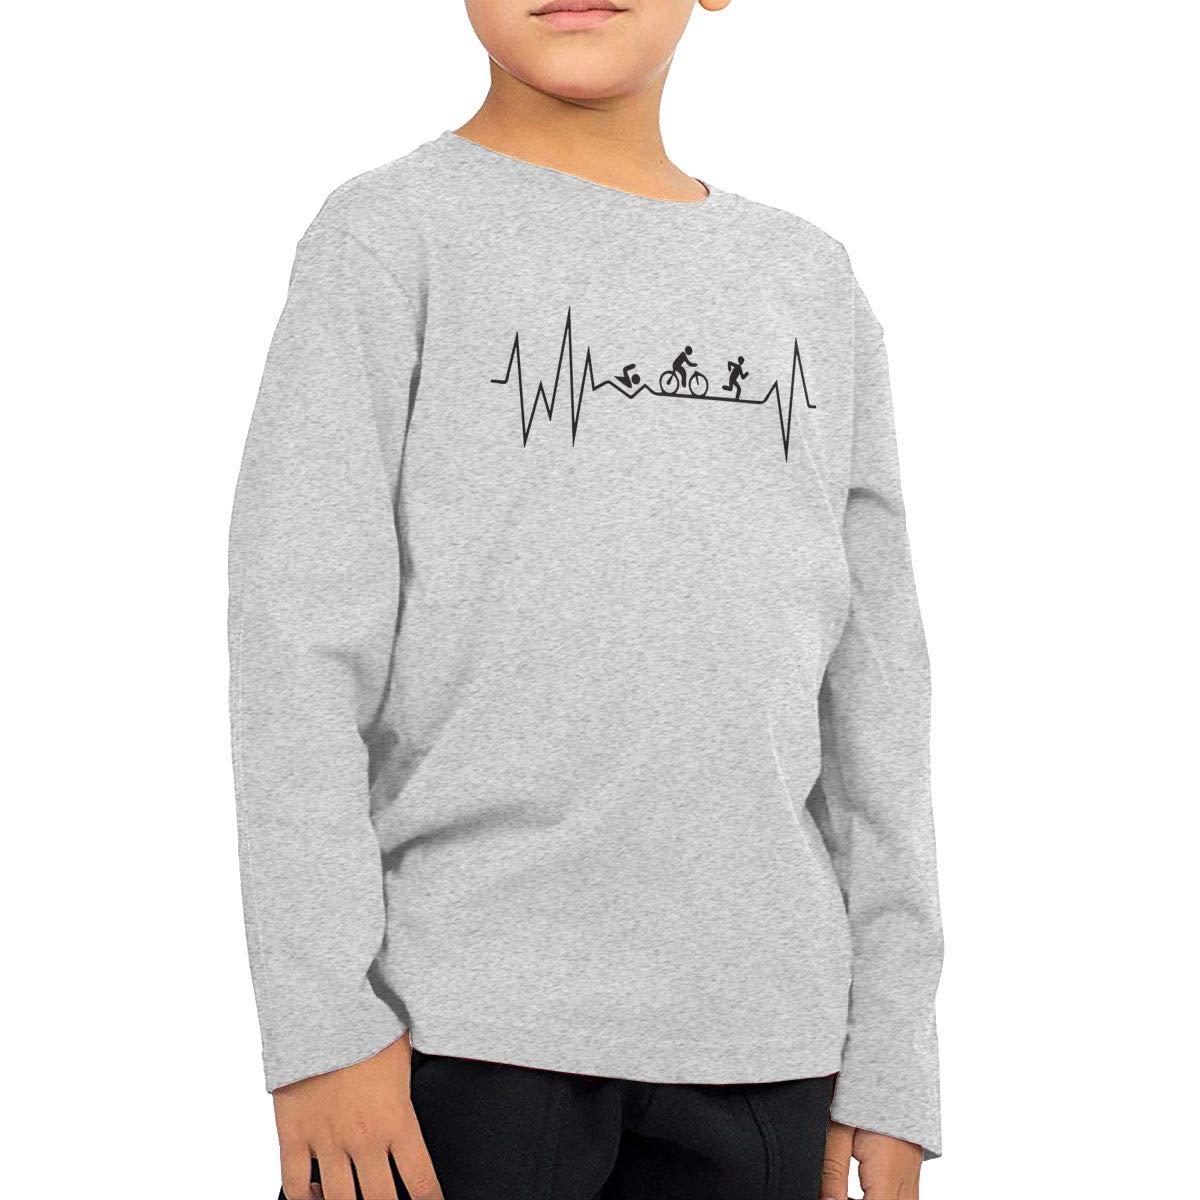 Triathlon Heartbeat Novelty Toddler Kid Baby Boys Girls Long Sleeve Tee Clothing